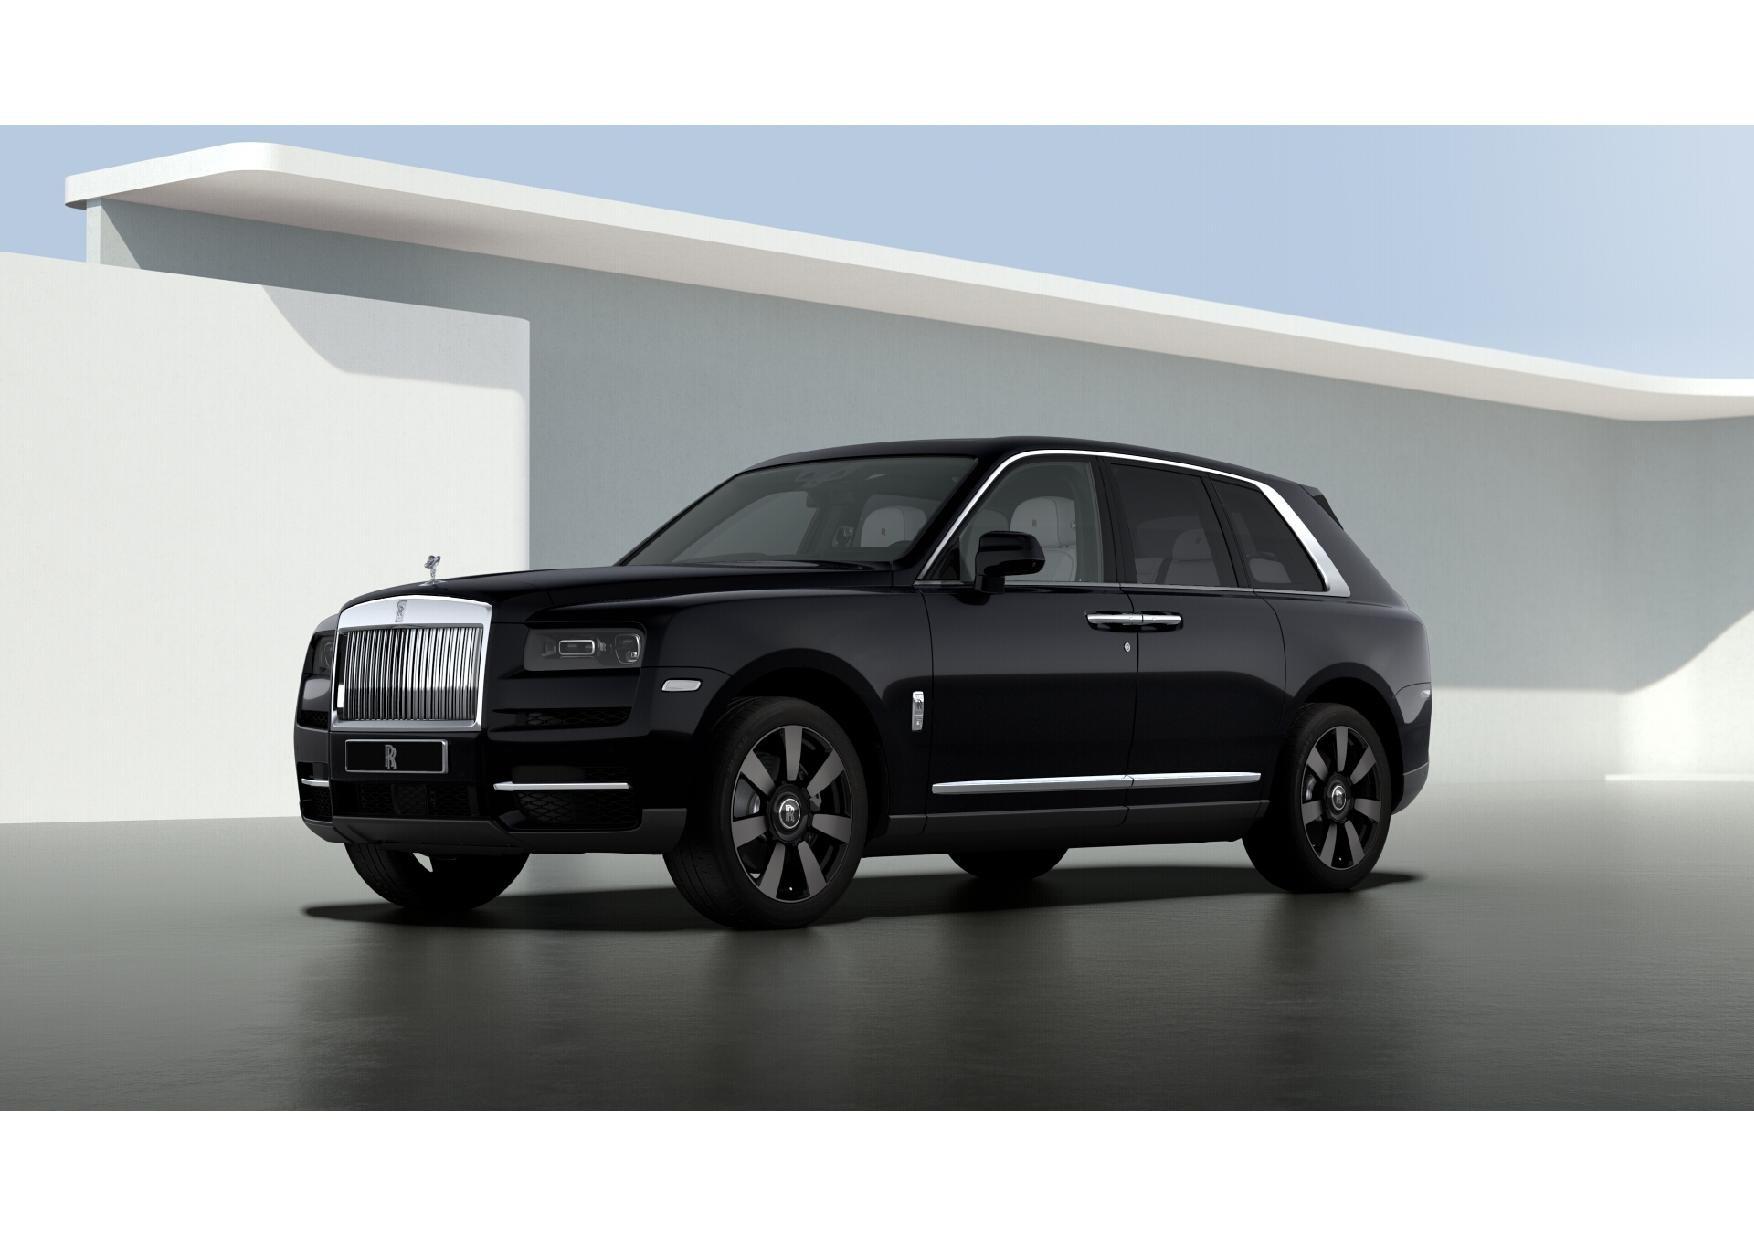 New 2021 Rolls-Royce Cullinan Base for sale $376,075 at Rolls-Royce Motor Cars Greenwich in Greenwich CT 06830 1